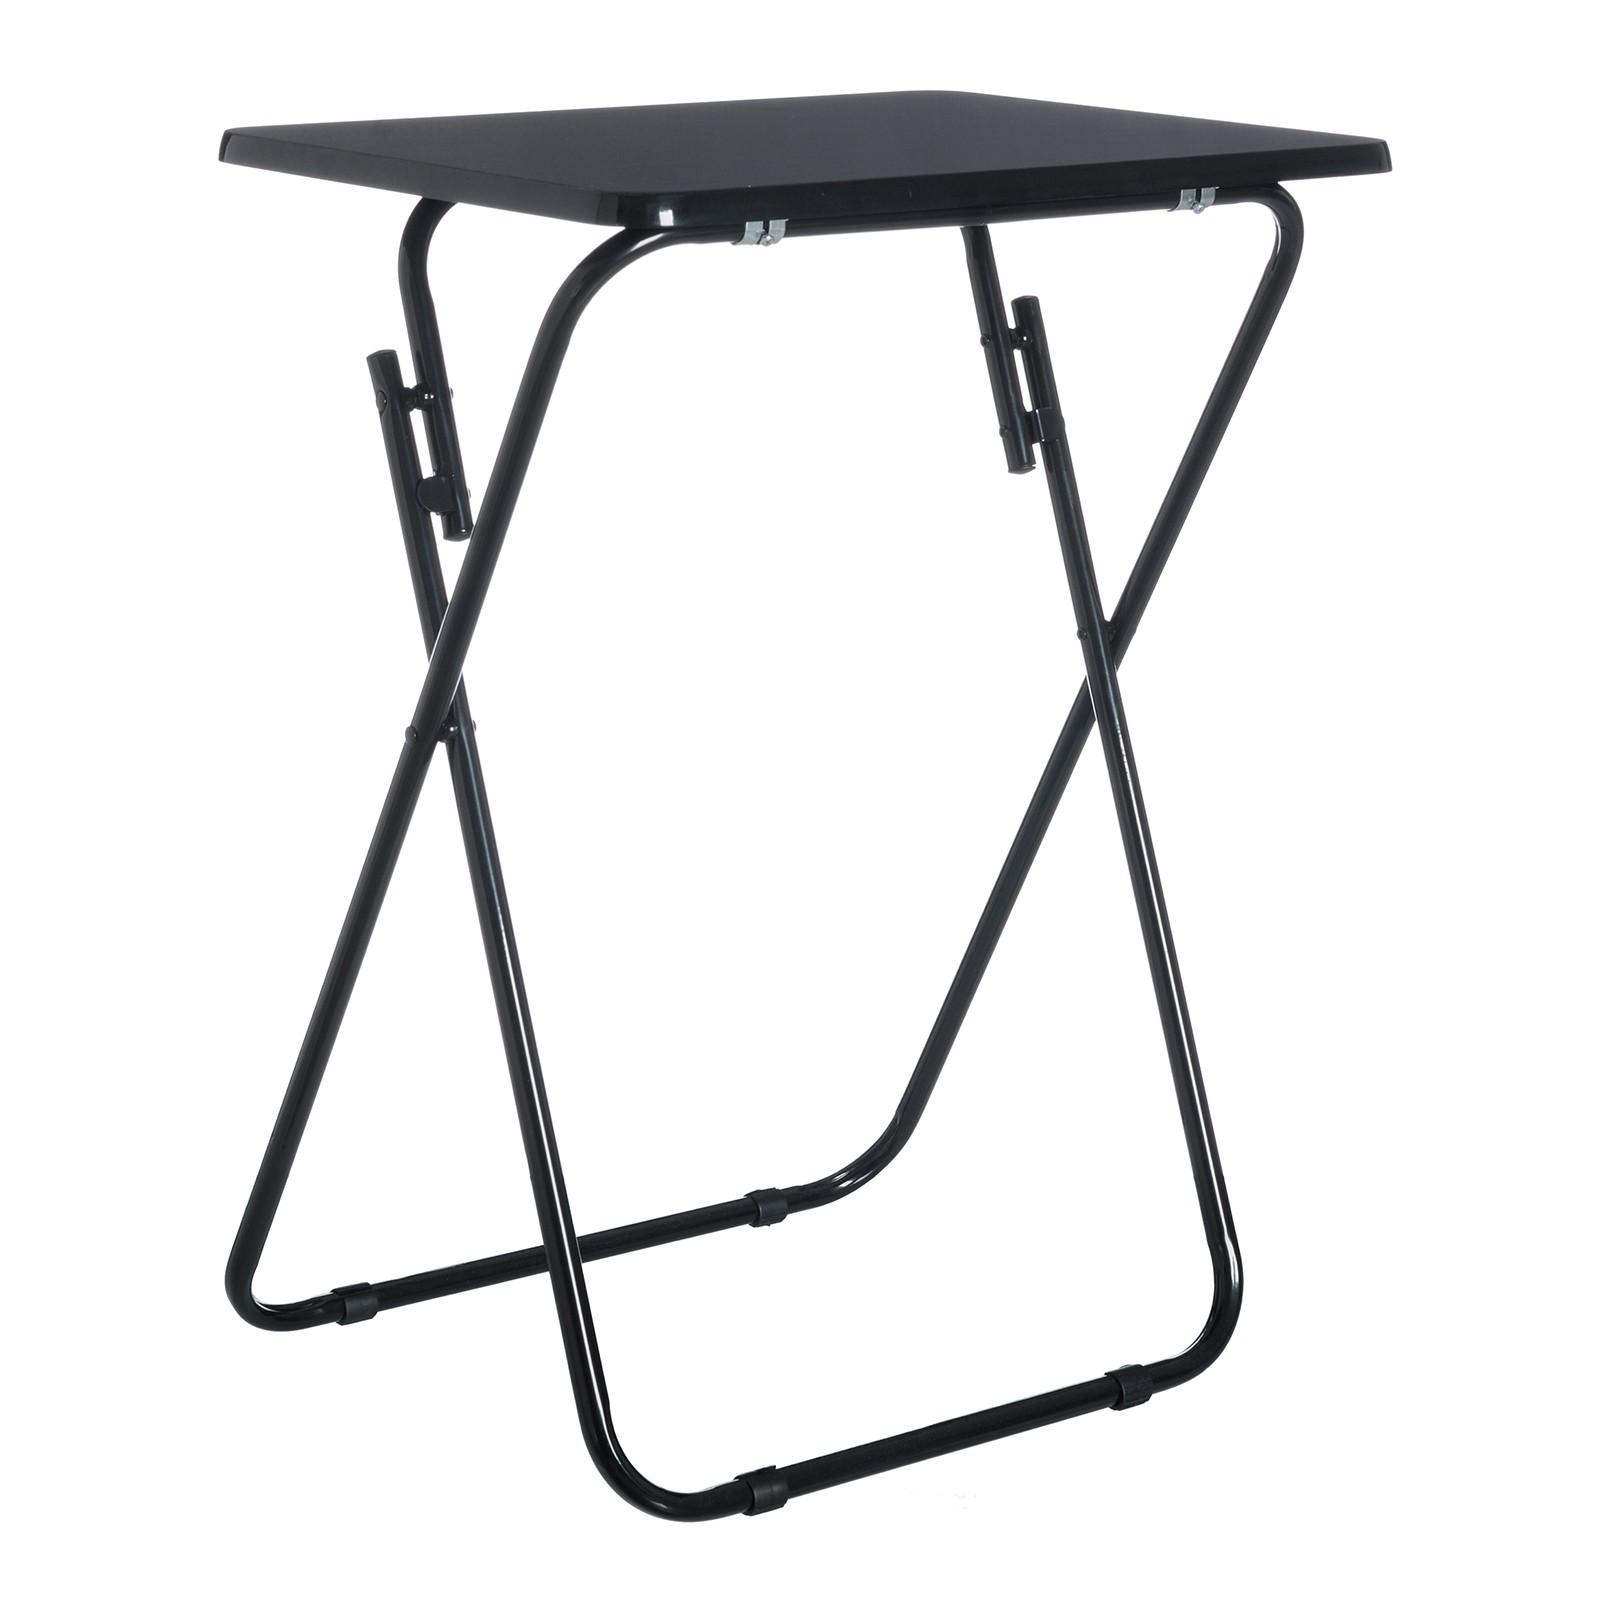 Mesas plegables metalicas interesting mesas metalicas con - Mesas de terraza plegables ...